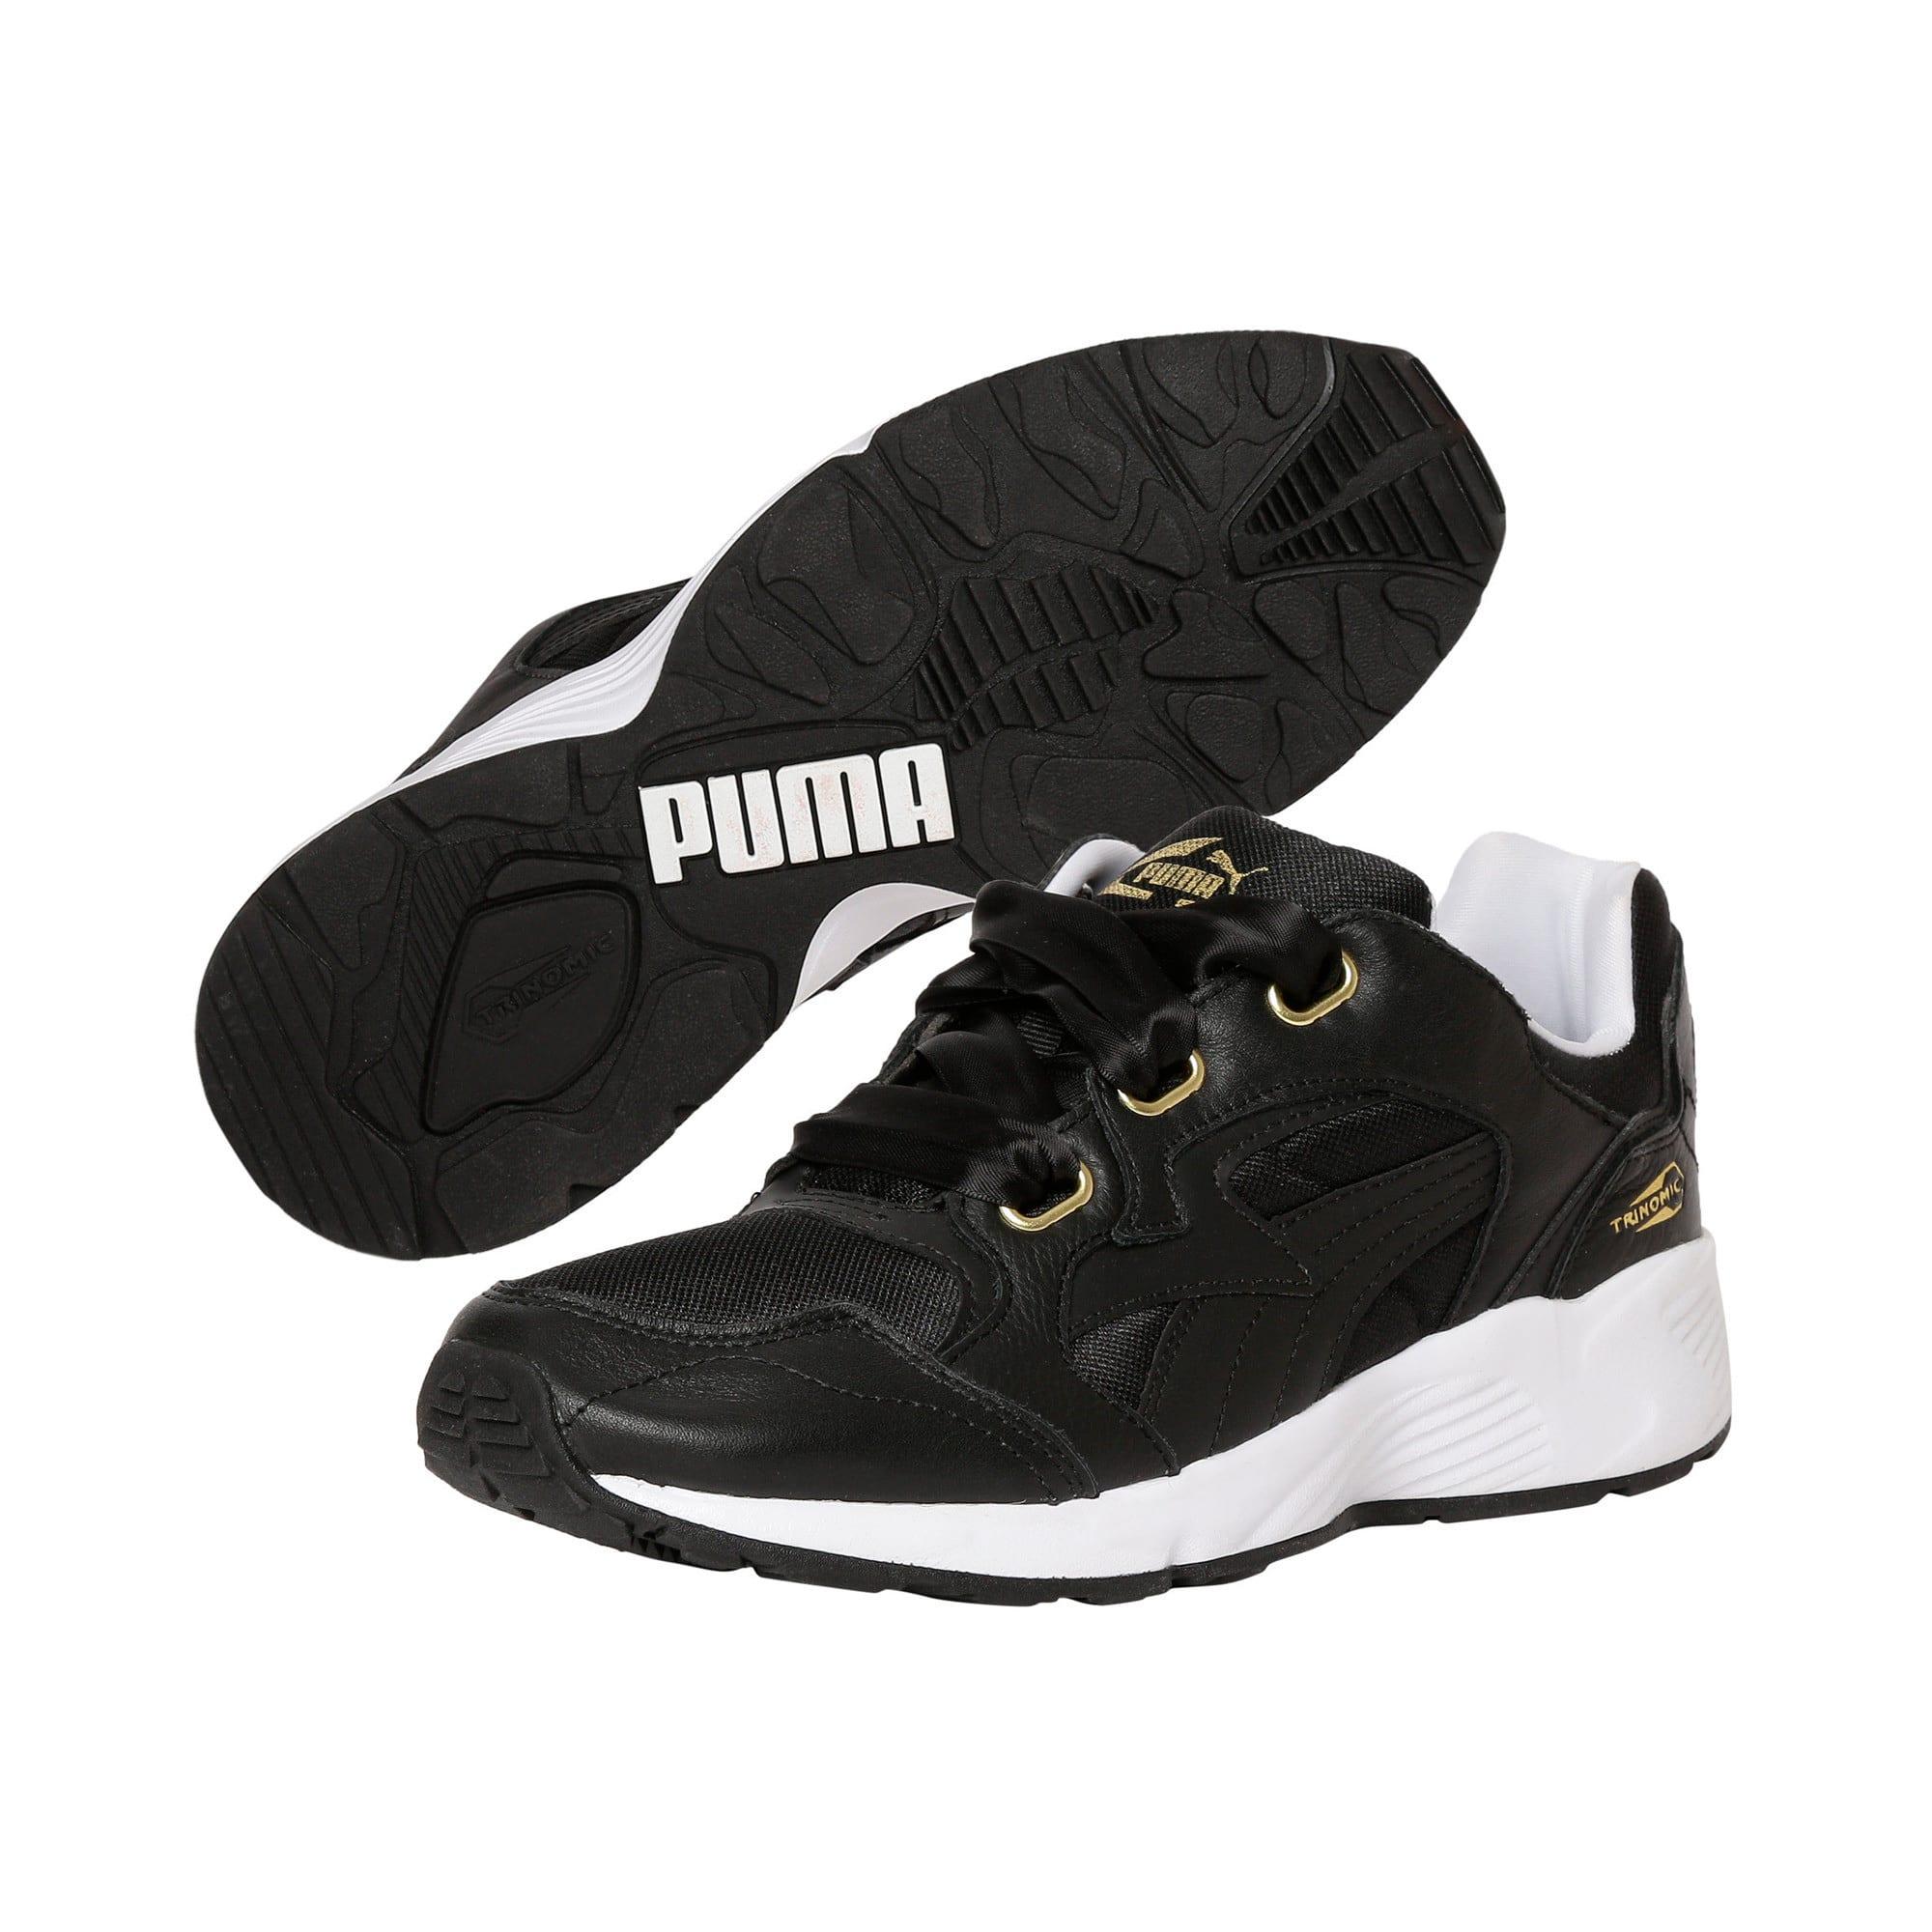 Thumbnail 2 of Prevail Heart Women's Trainers, Puma Black-Puma Black, medium-IND